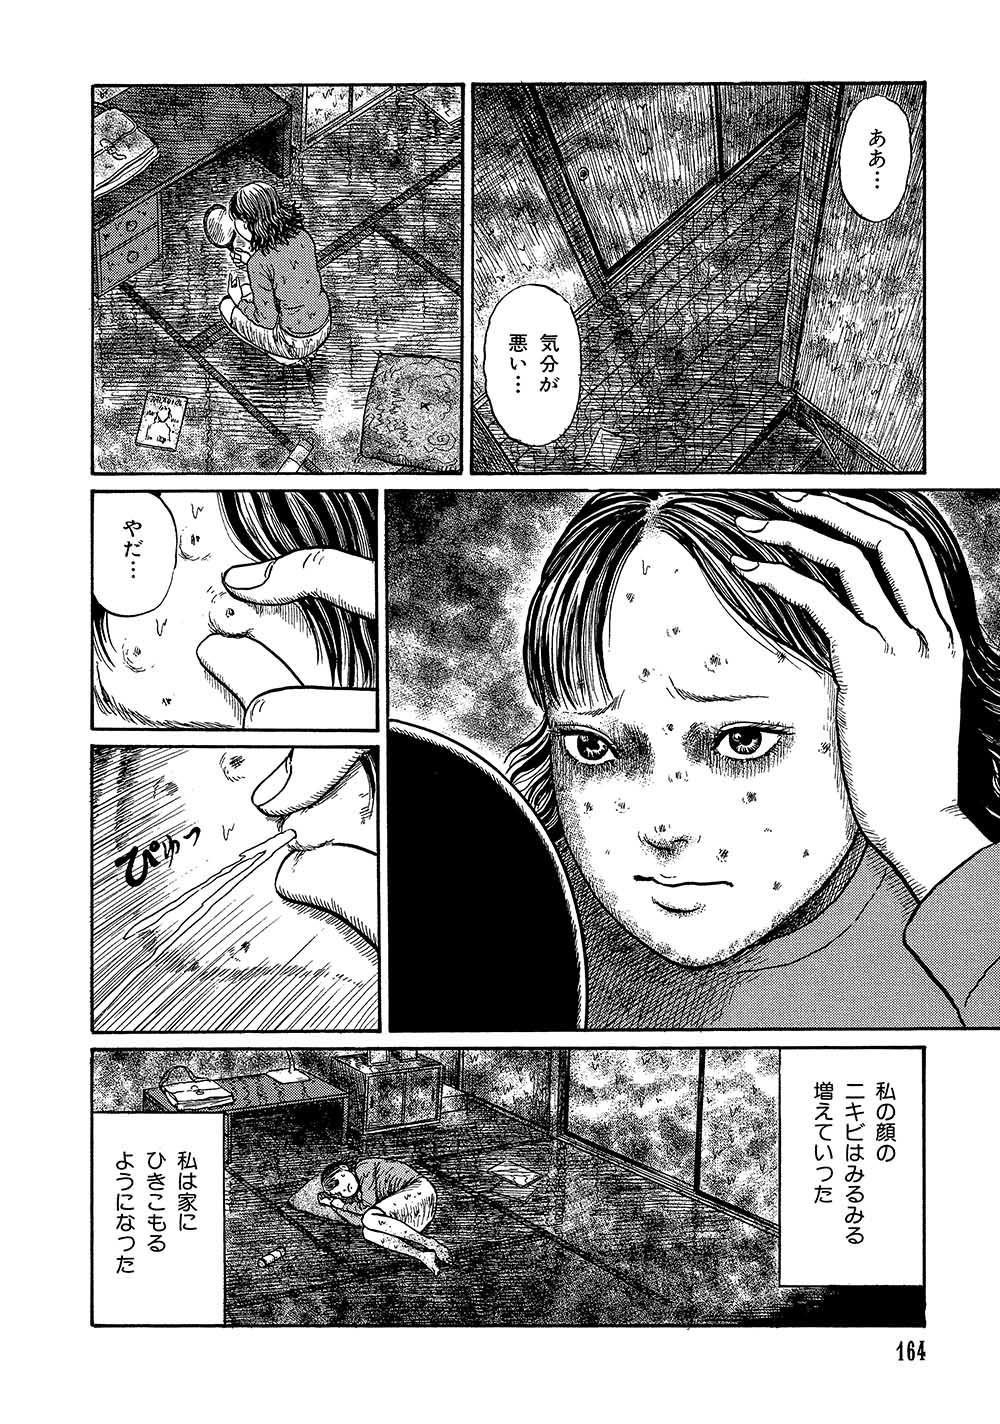 yami_0001_0164.jpg